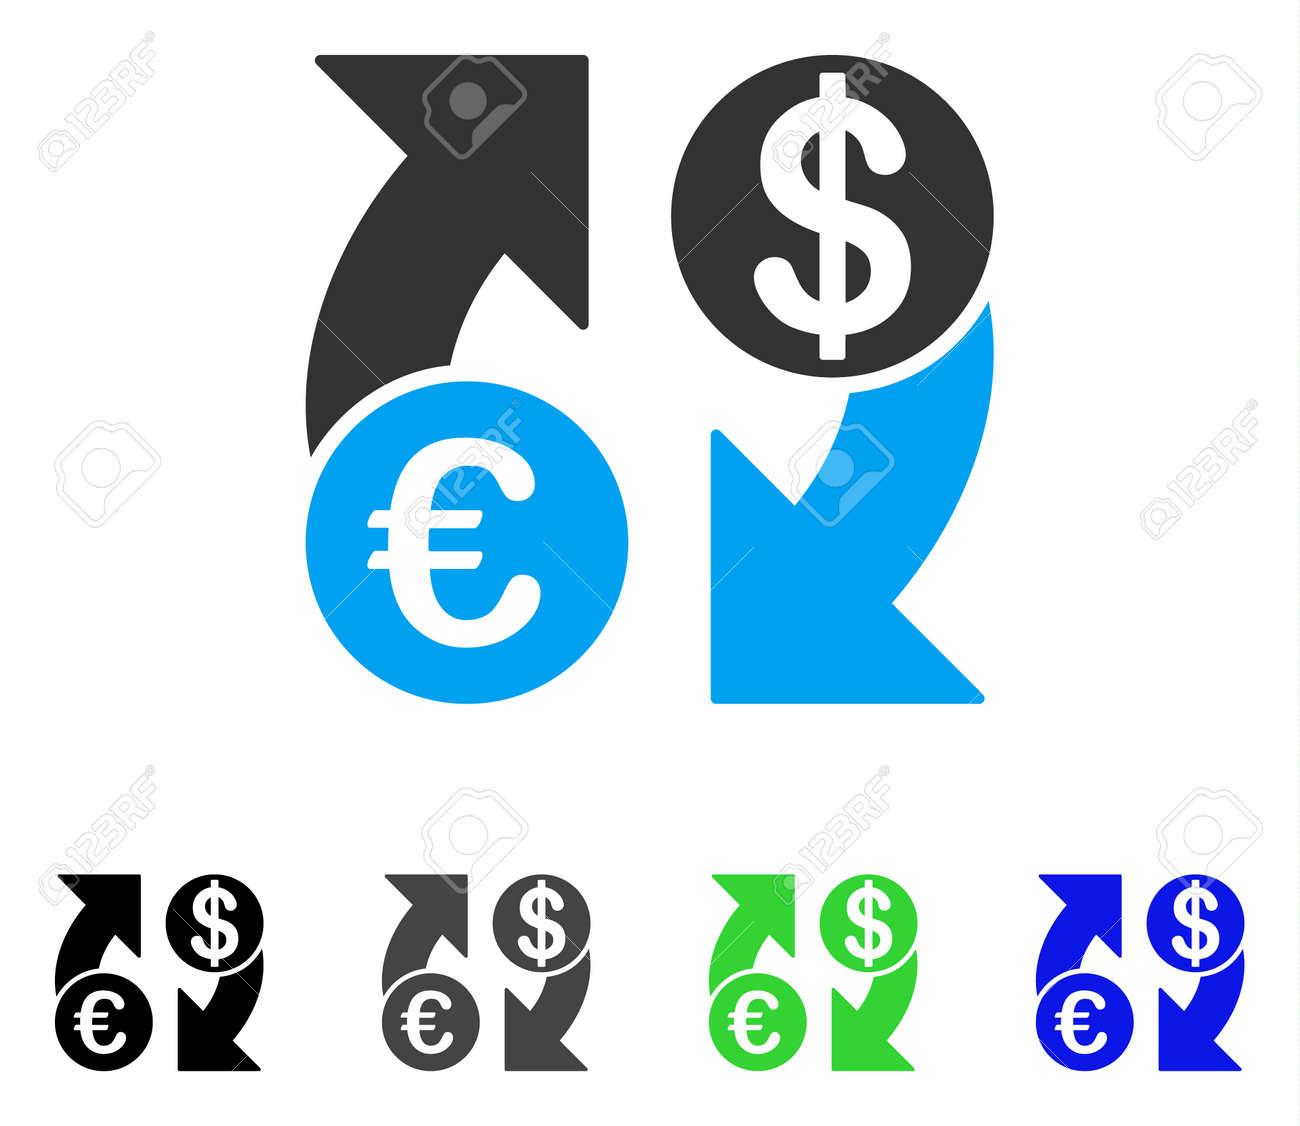 Euro Dollar Exchange Flechas Vector Icono Plano. Coloreado Dólar ...